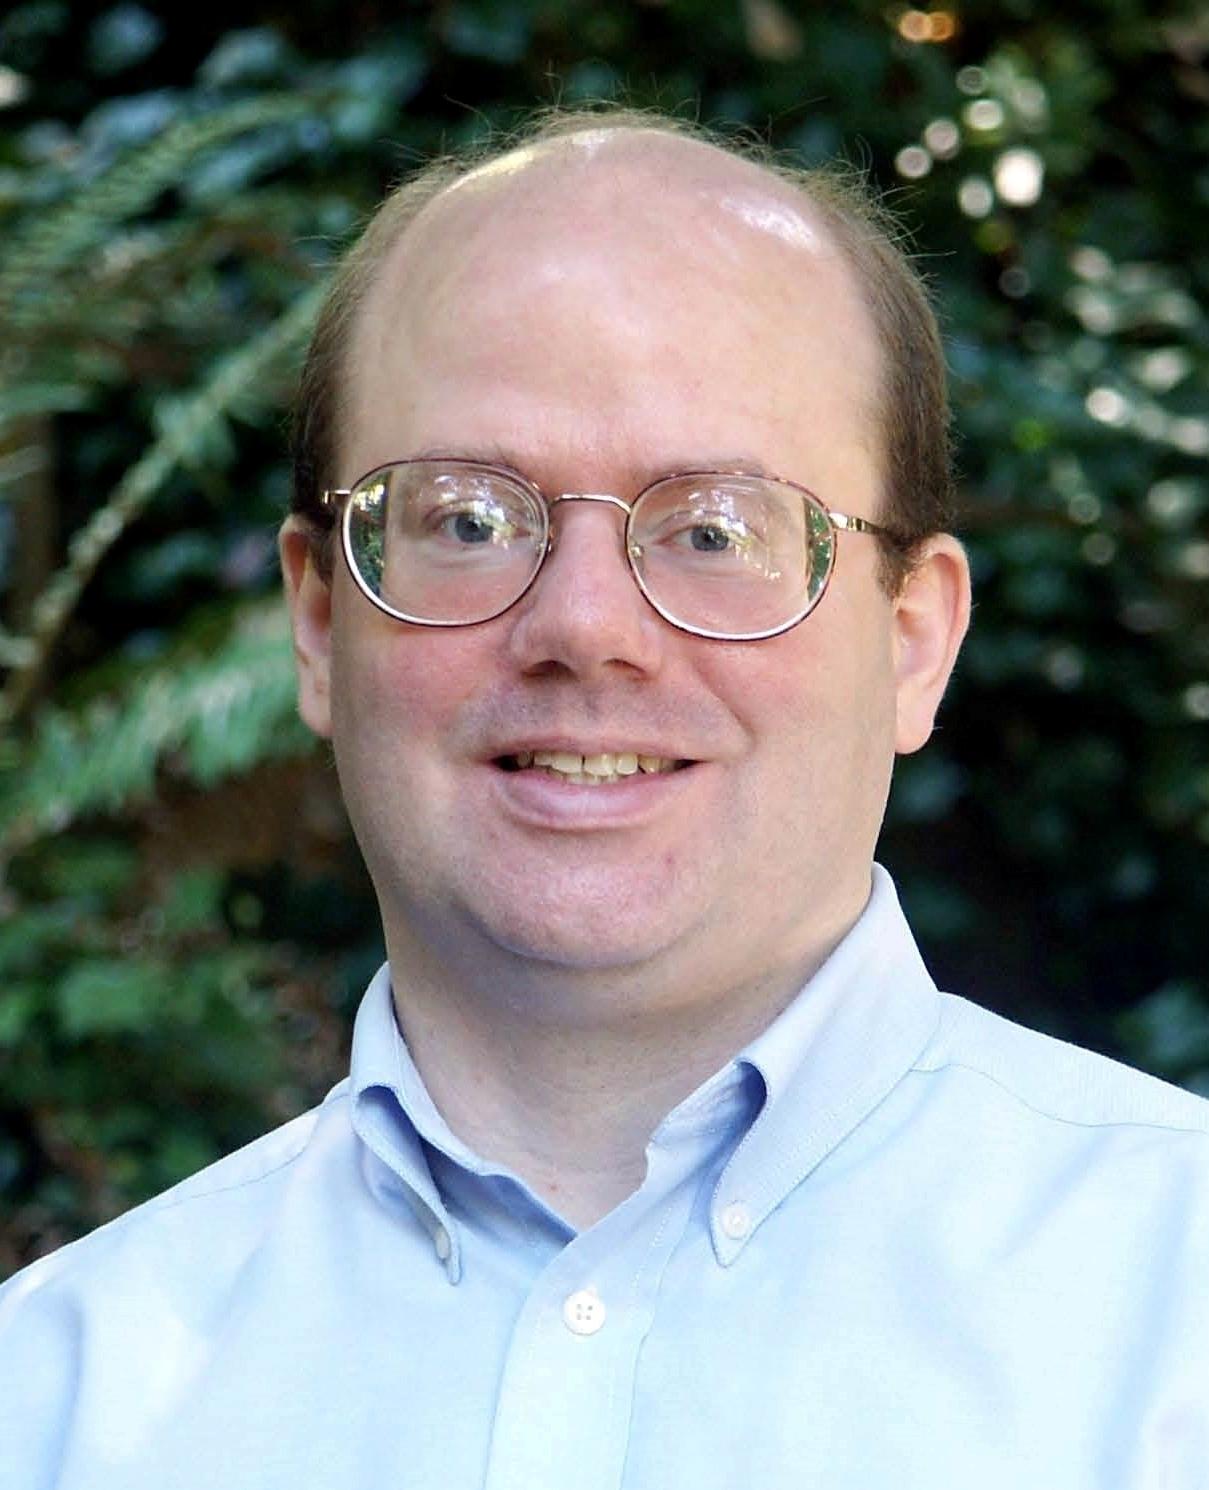 Larry Sanger - Wikipedia creator